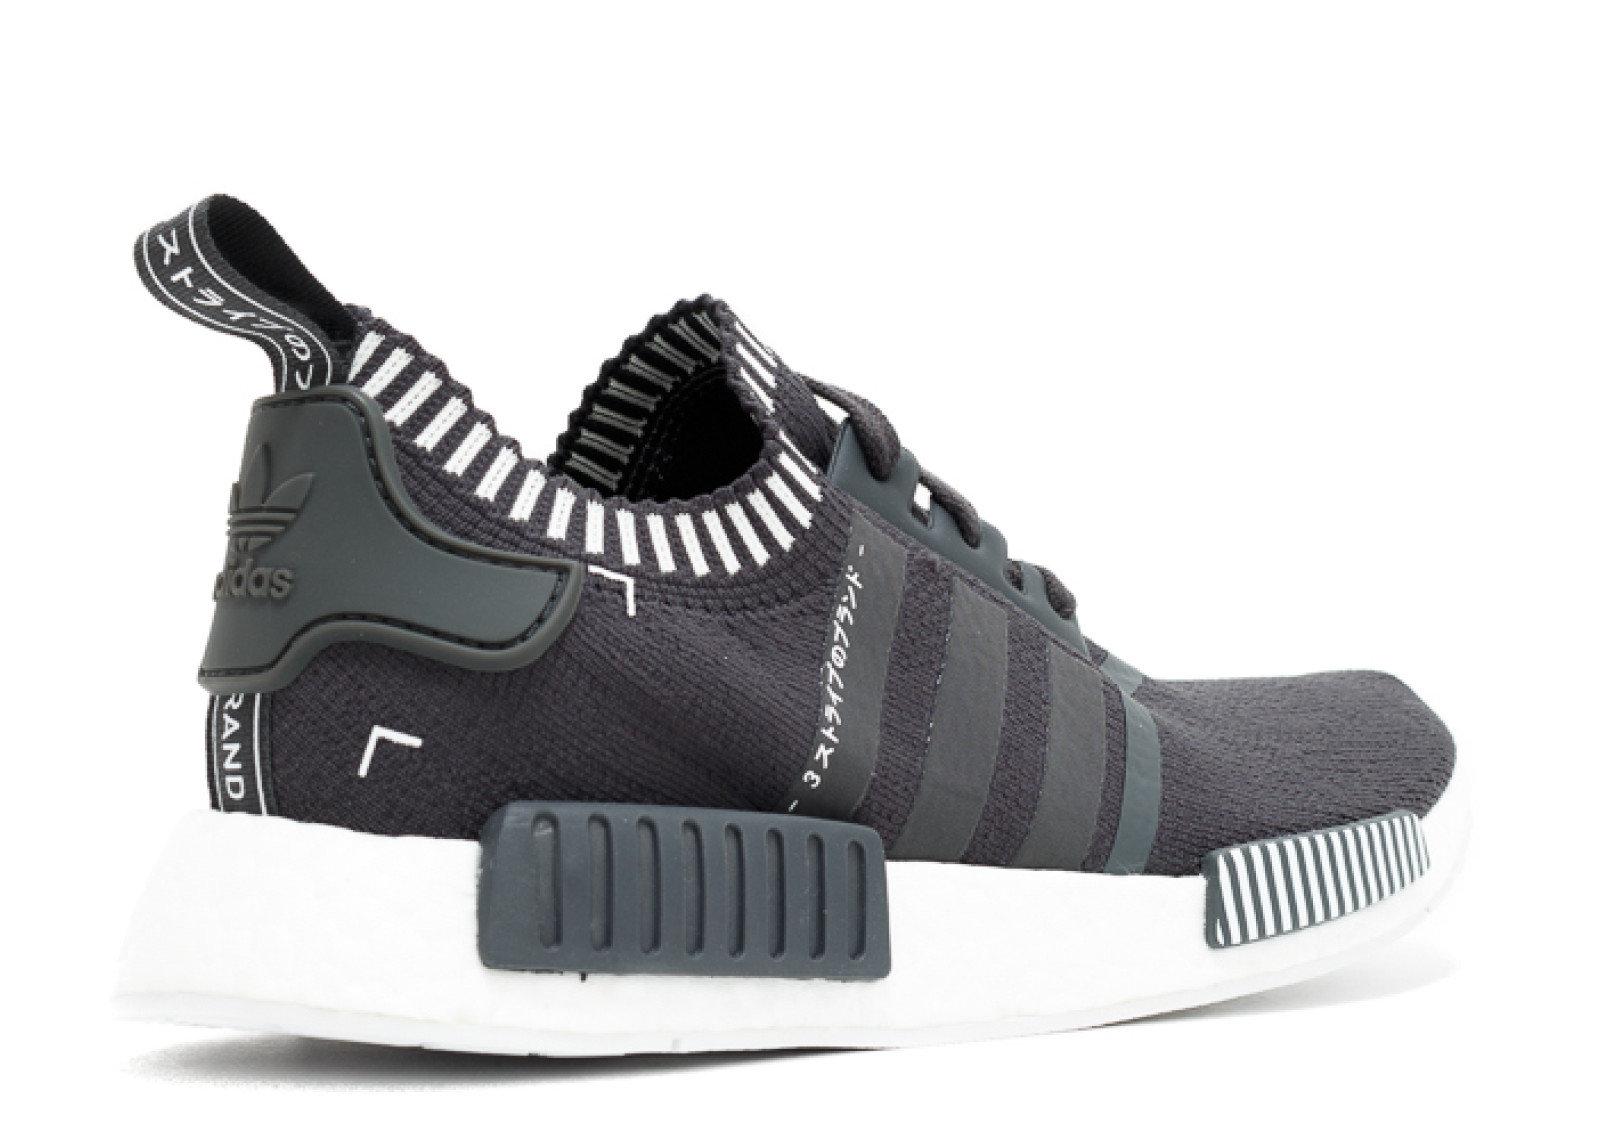 sale retailer b4d83 71a8e Adidas NMD R1 Primeknit